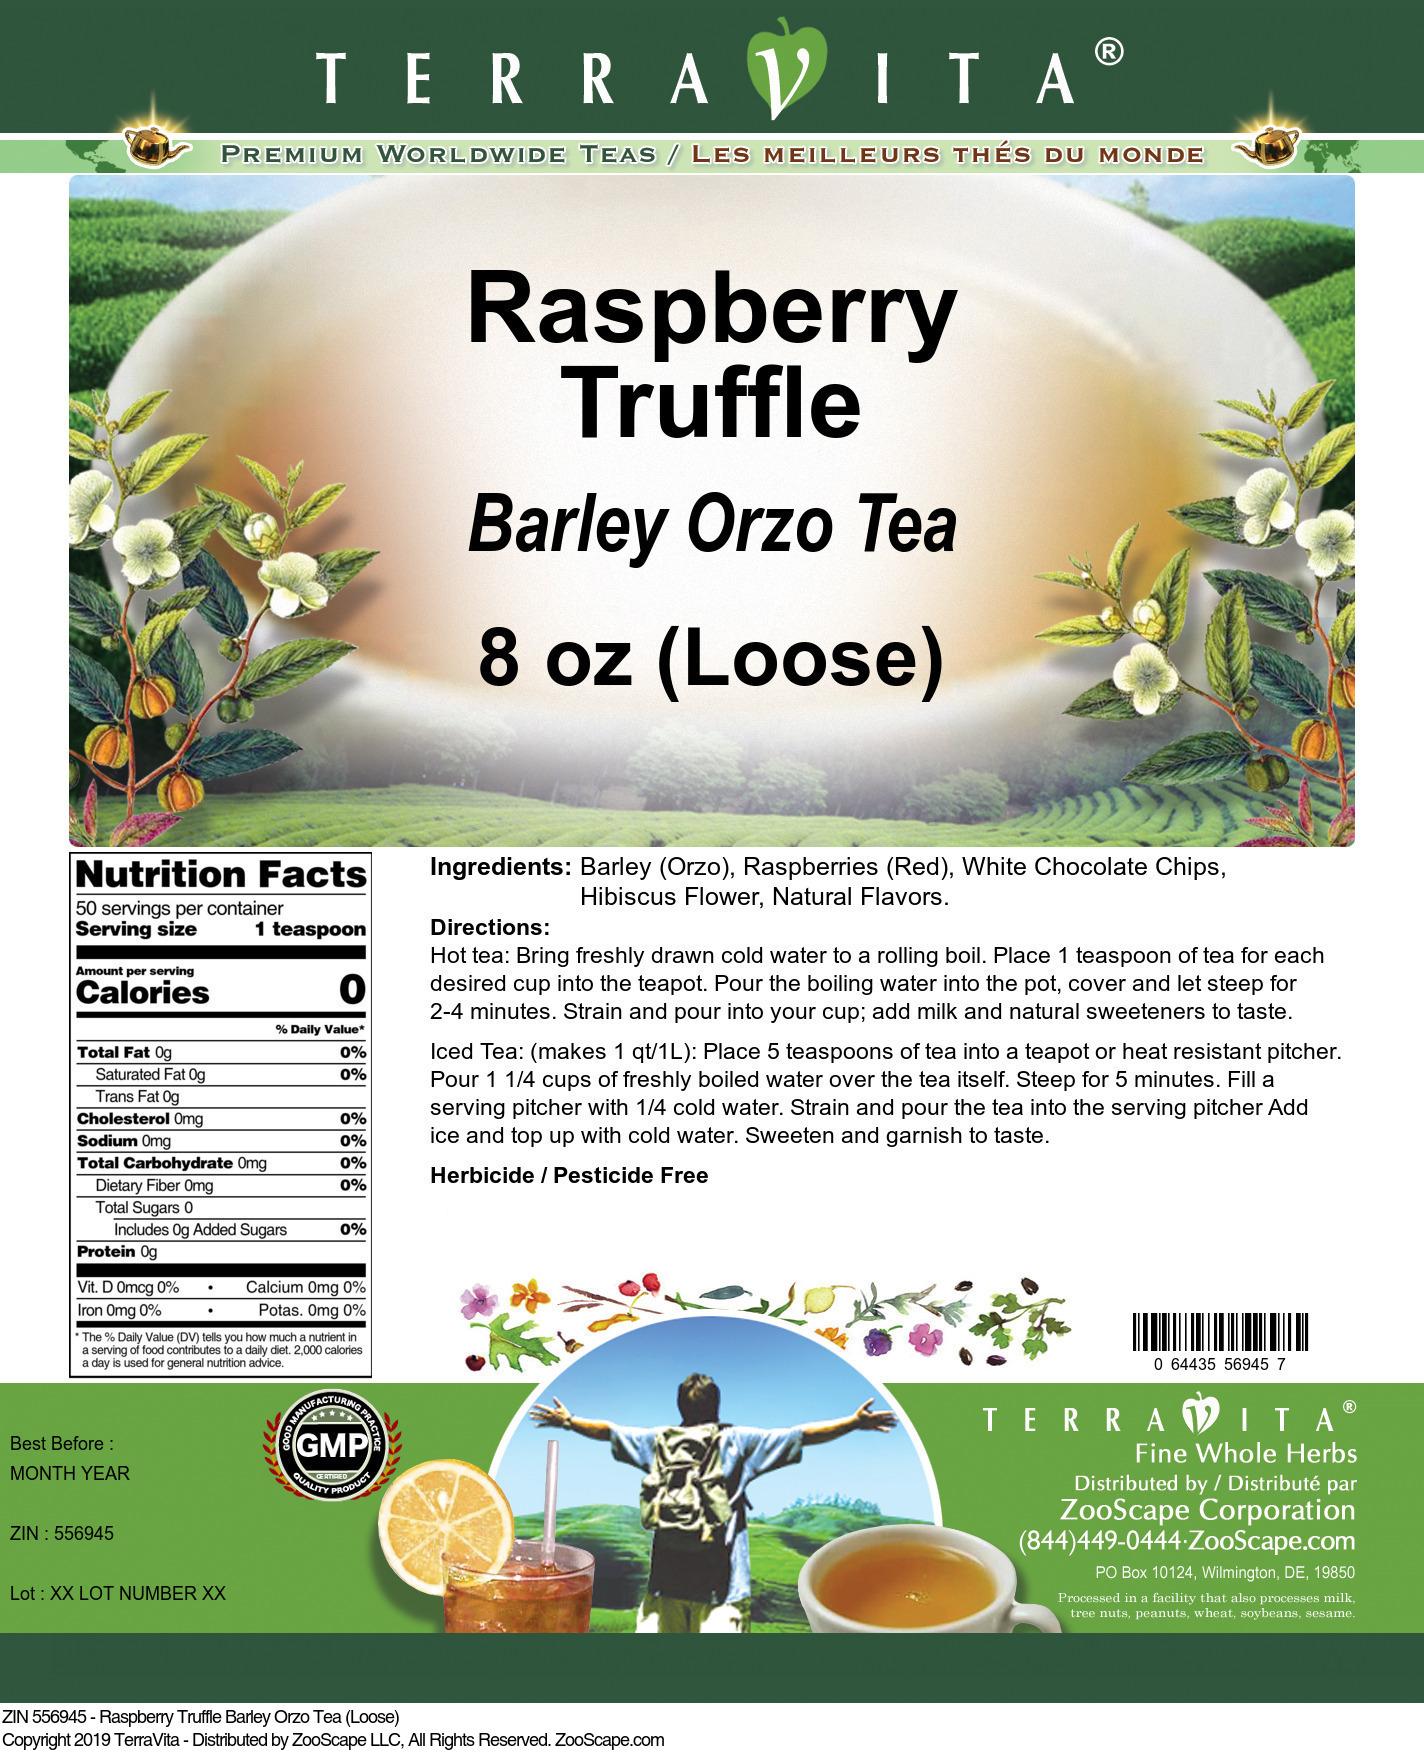 Raspberry Truffle Barley Orzo